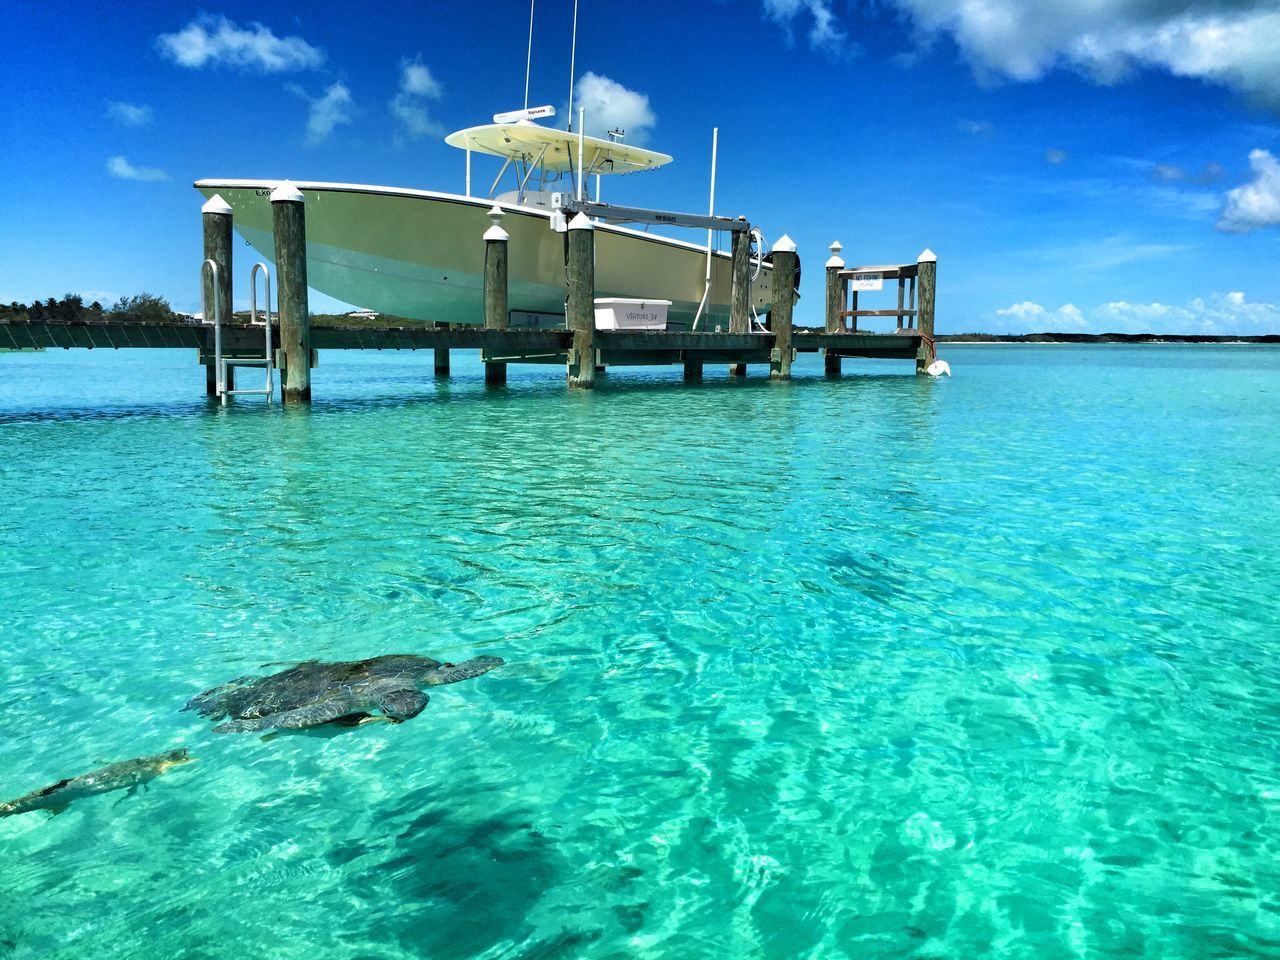 Beautiful stock photos of bahamas, water, blue, sea, waterfront